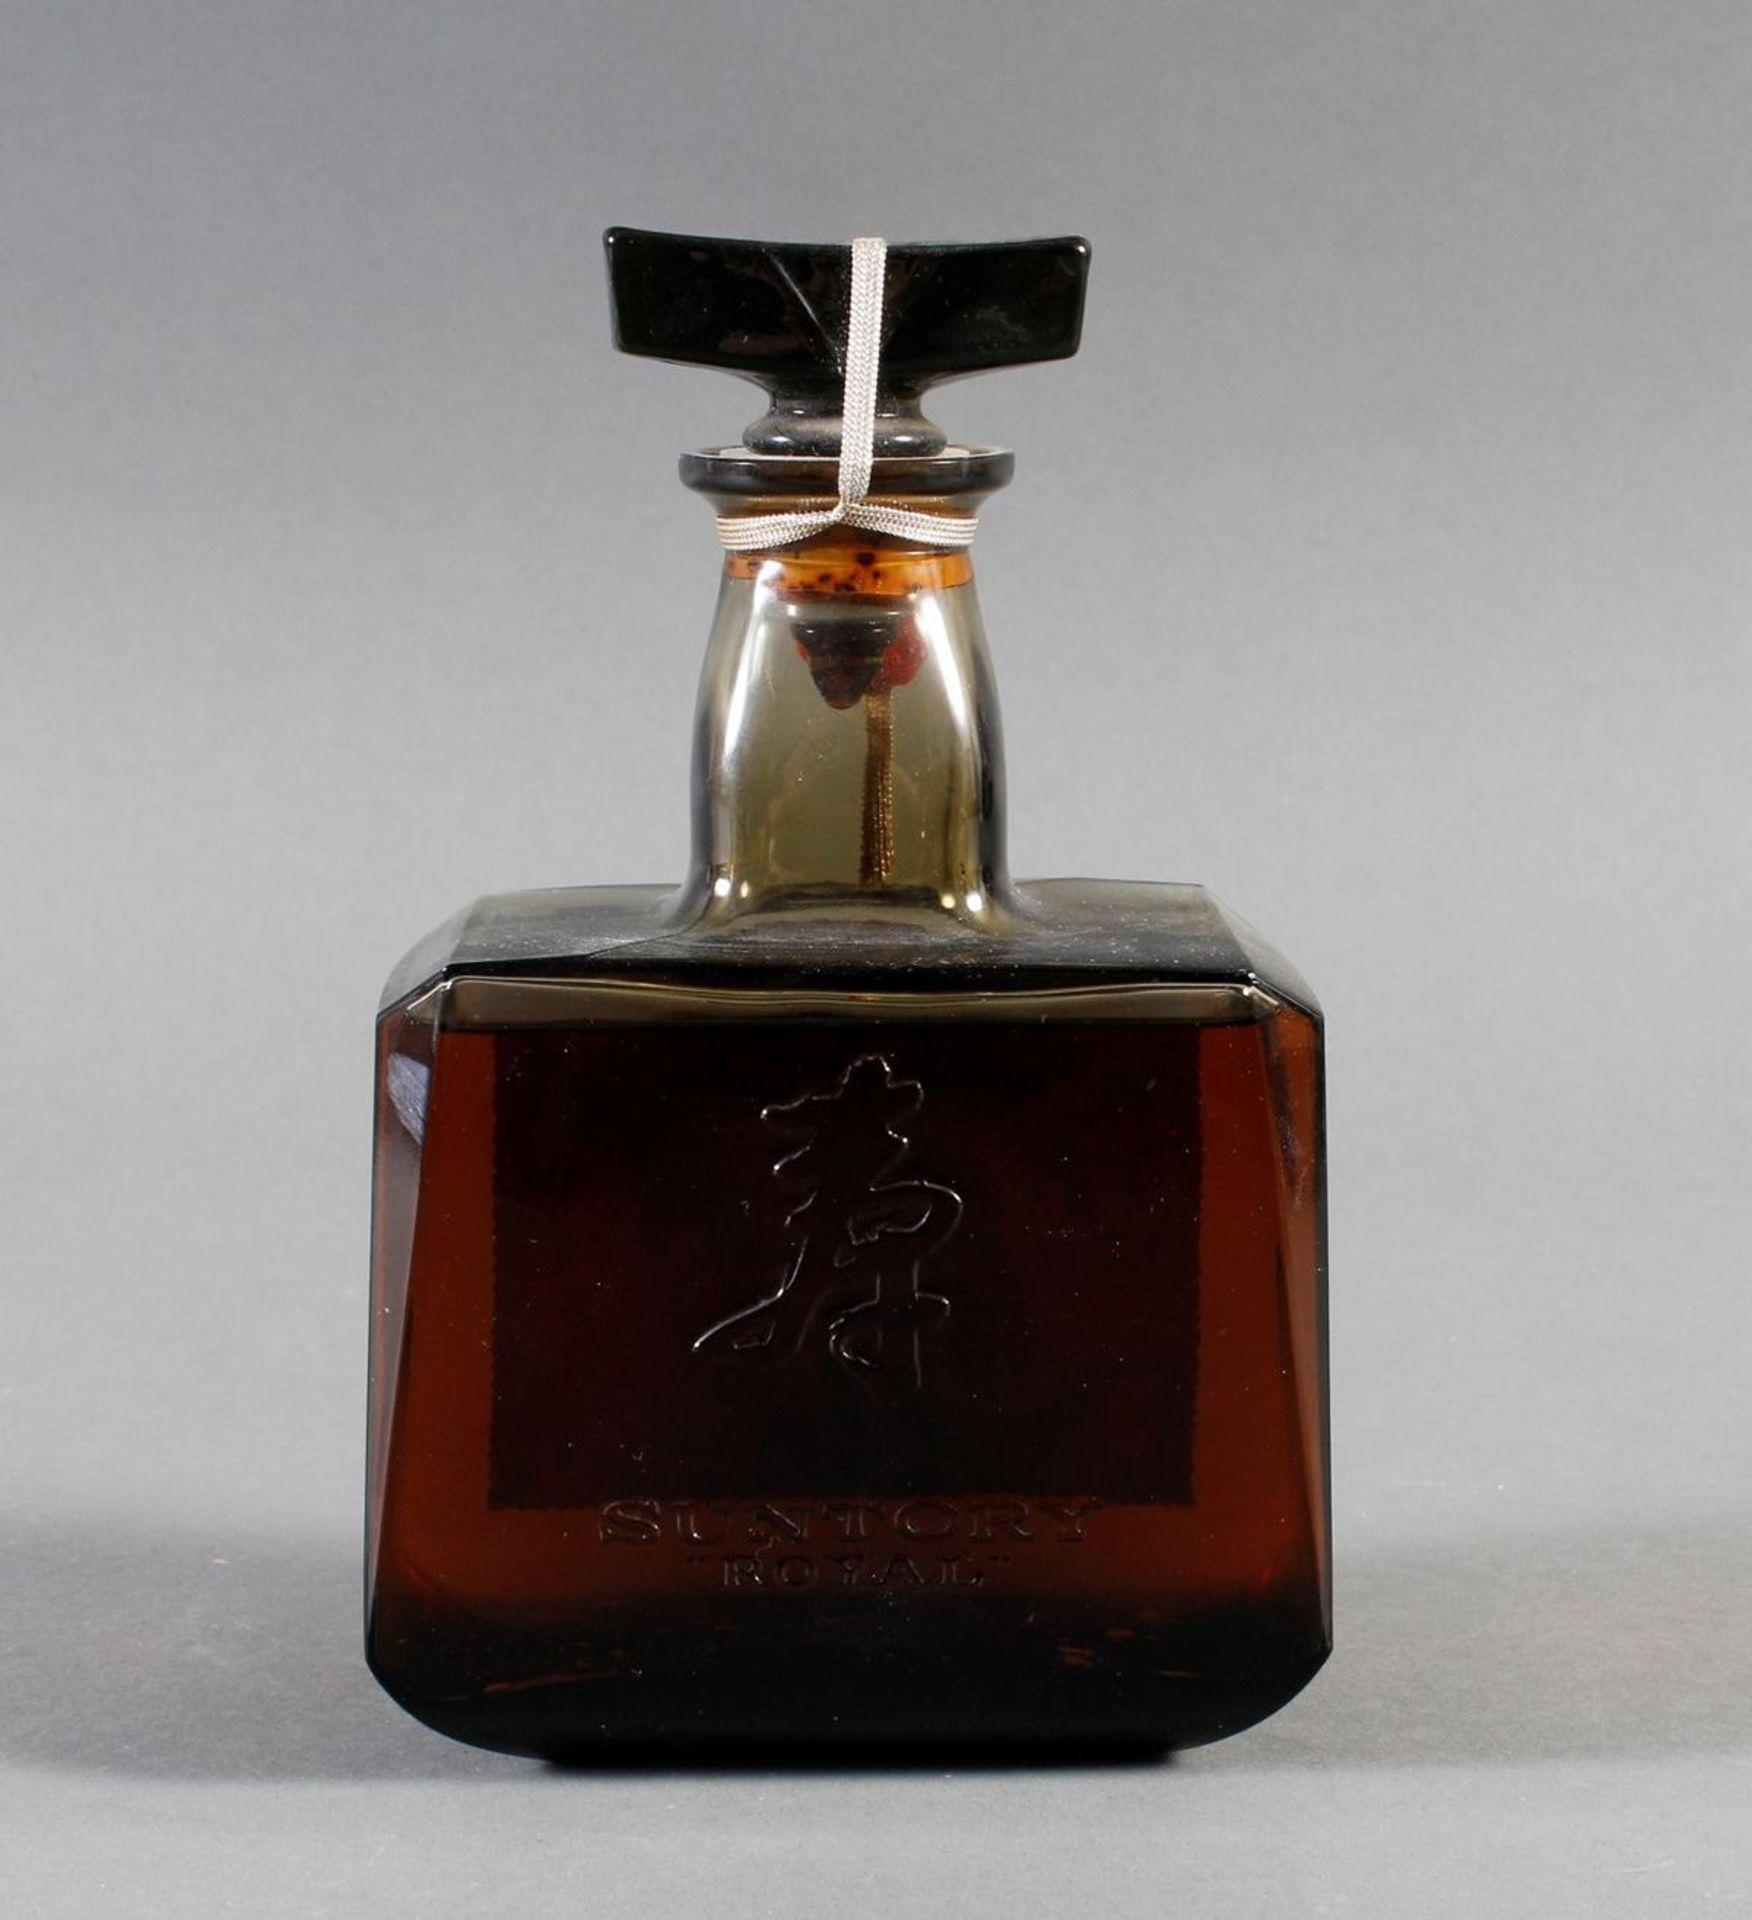 Rare Old Whisky Suntory Royal ´60 Special Reserve Yamazaki - Bild 2 aus 3